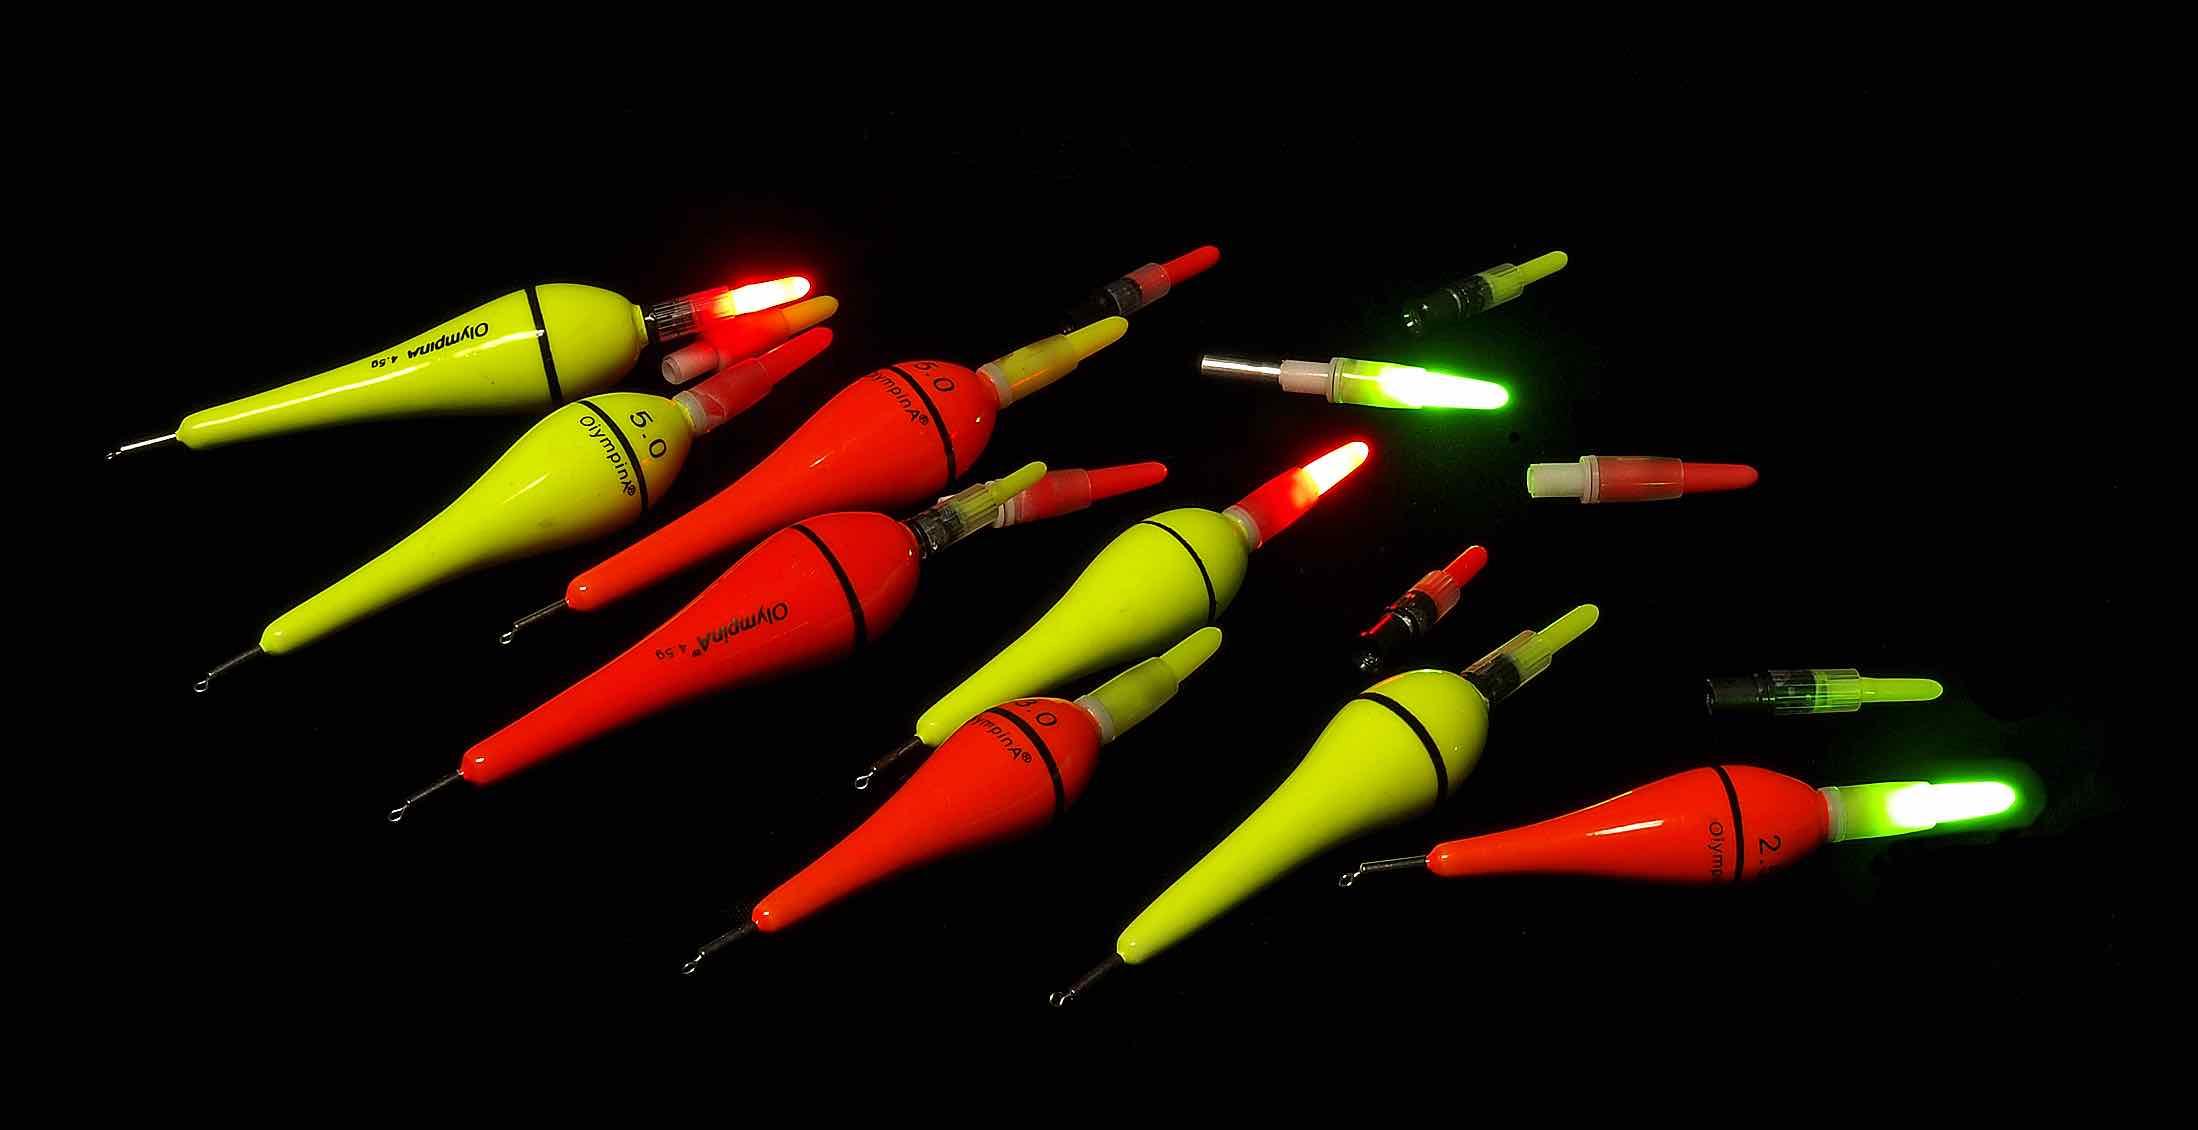 OlympinA-Waterproof-Battery-Operated-Night-Floats